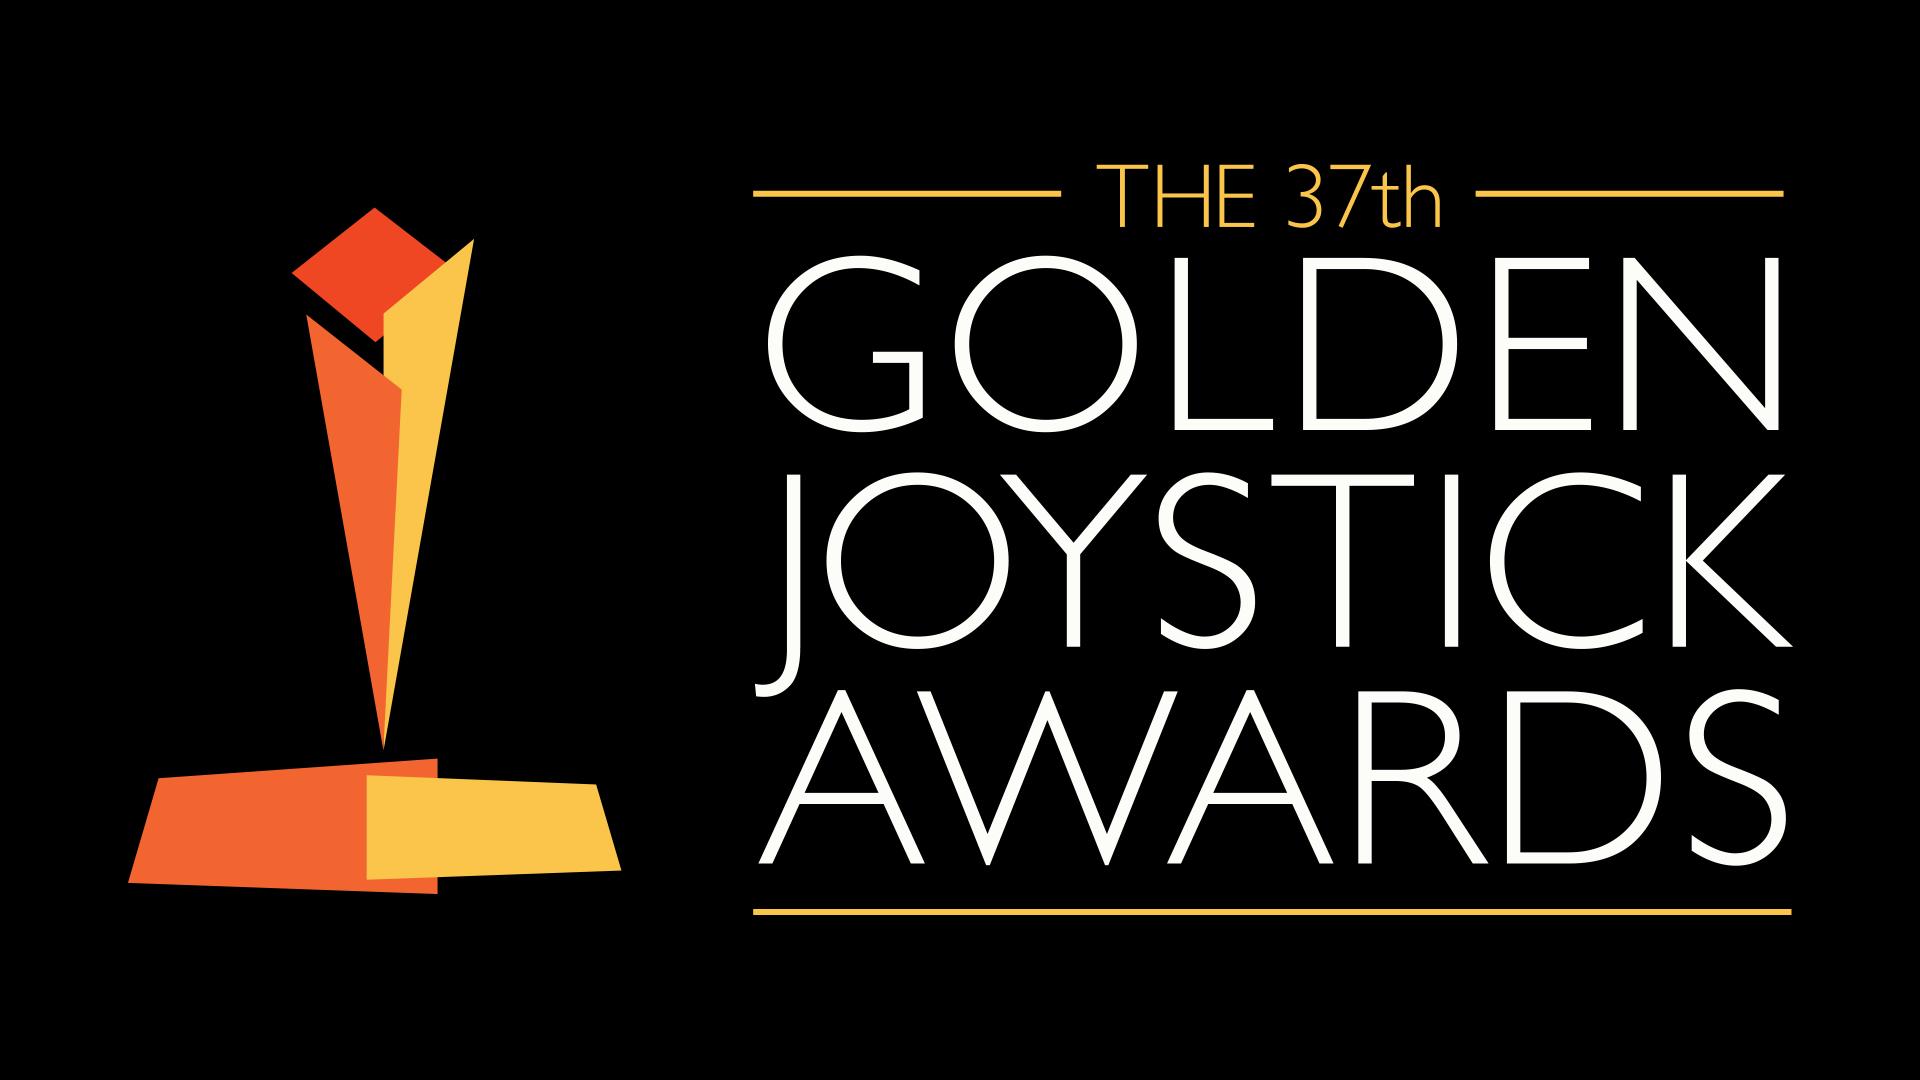 Golden Joystick Awards 37th Edition